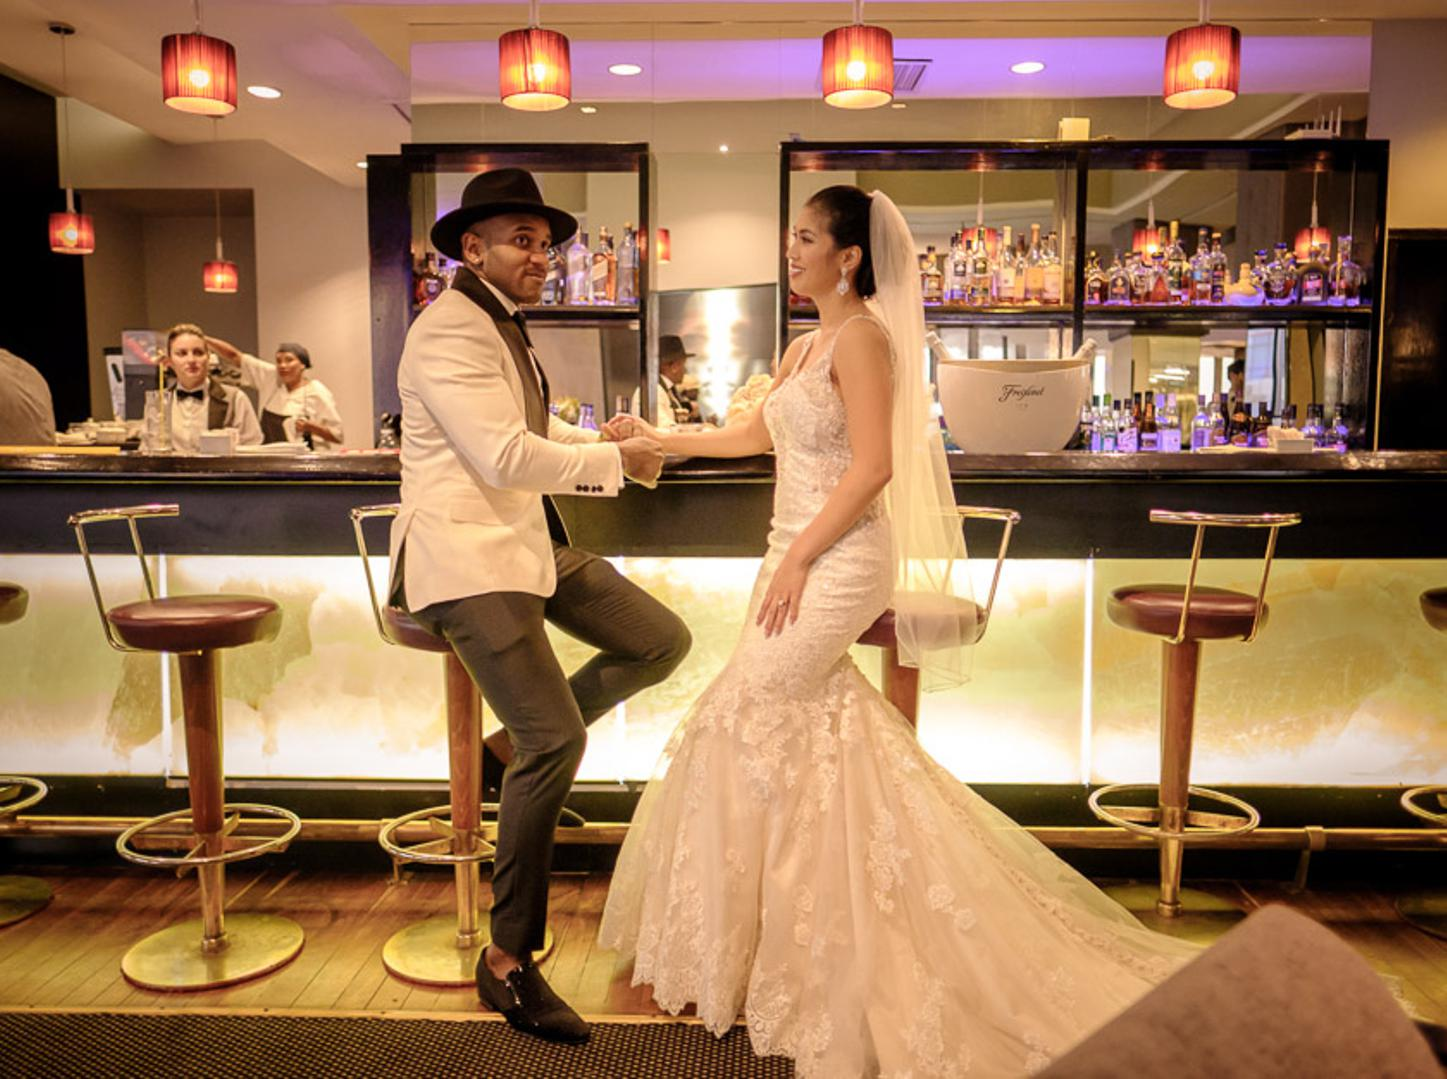 bodas-sin-clasificar-sin-tema-cuba-41151.jpg